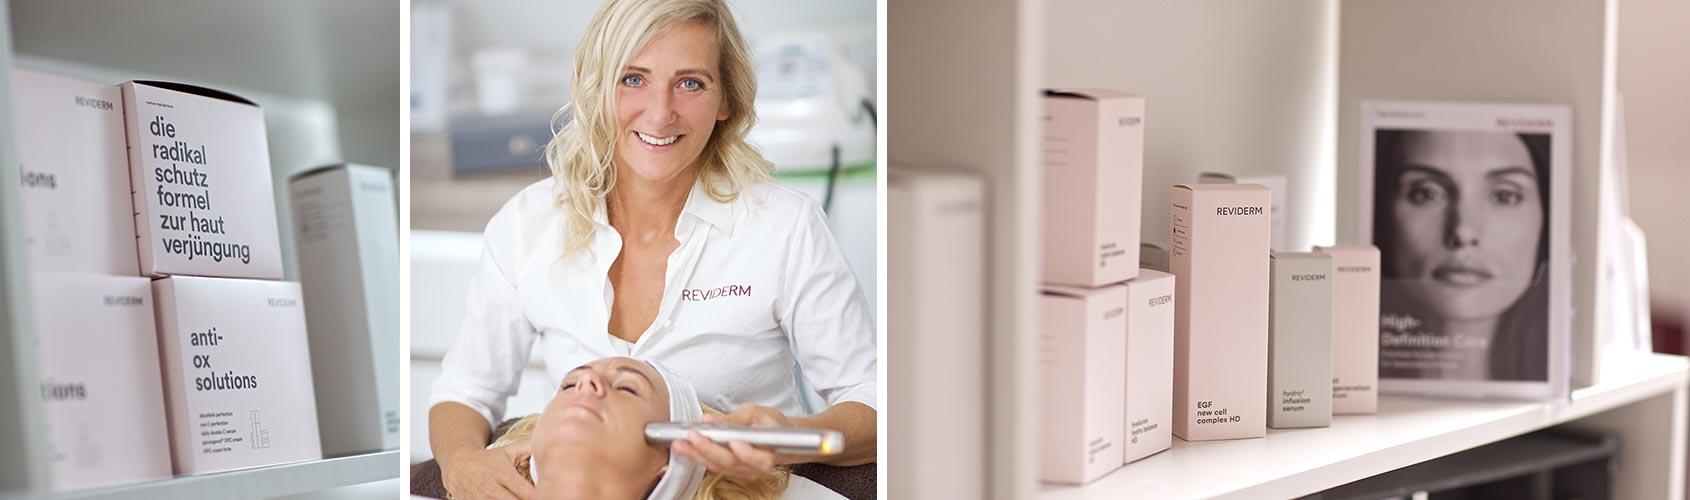 Kosmetikstudio Reviderm - Bezirk Baden